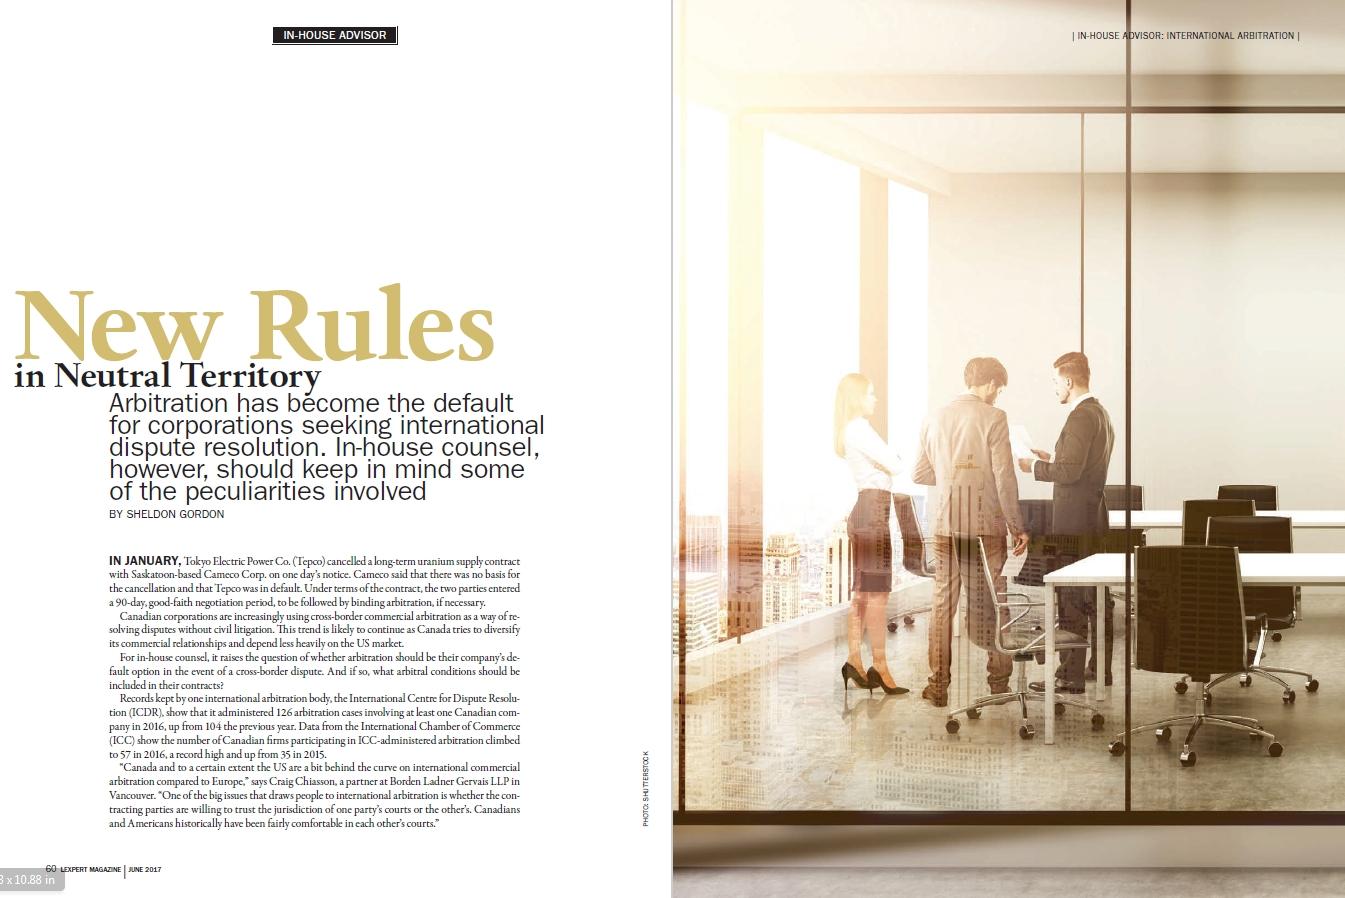 In-House Advisor: New Rules in Neutral Territory